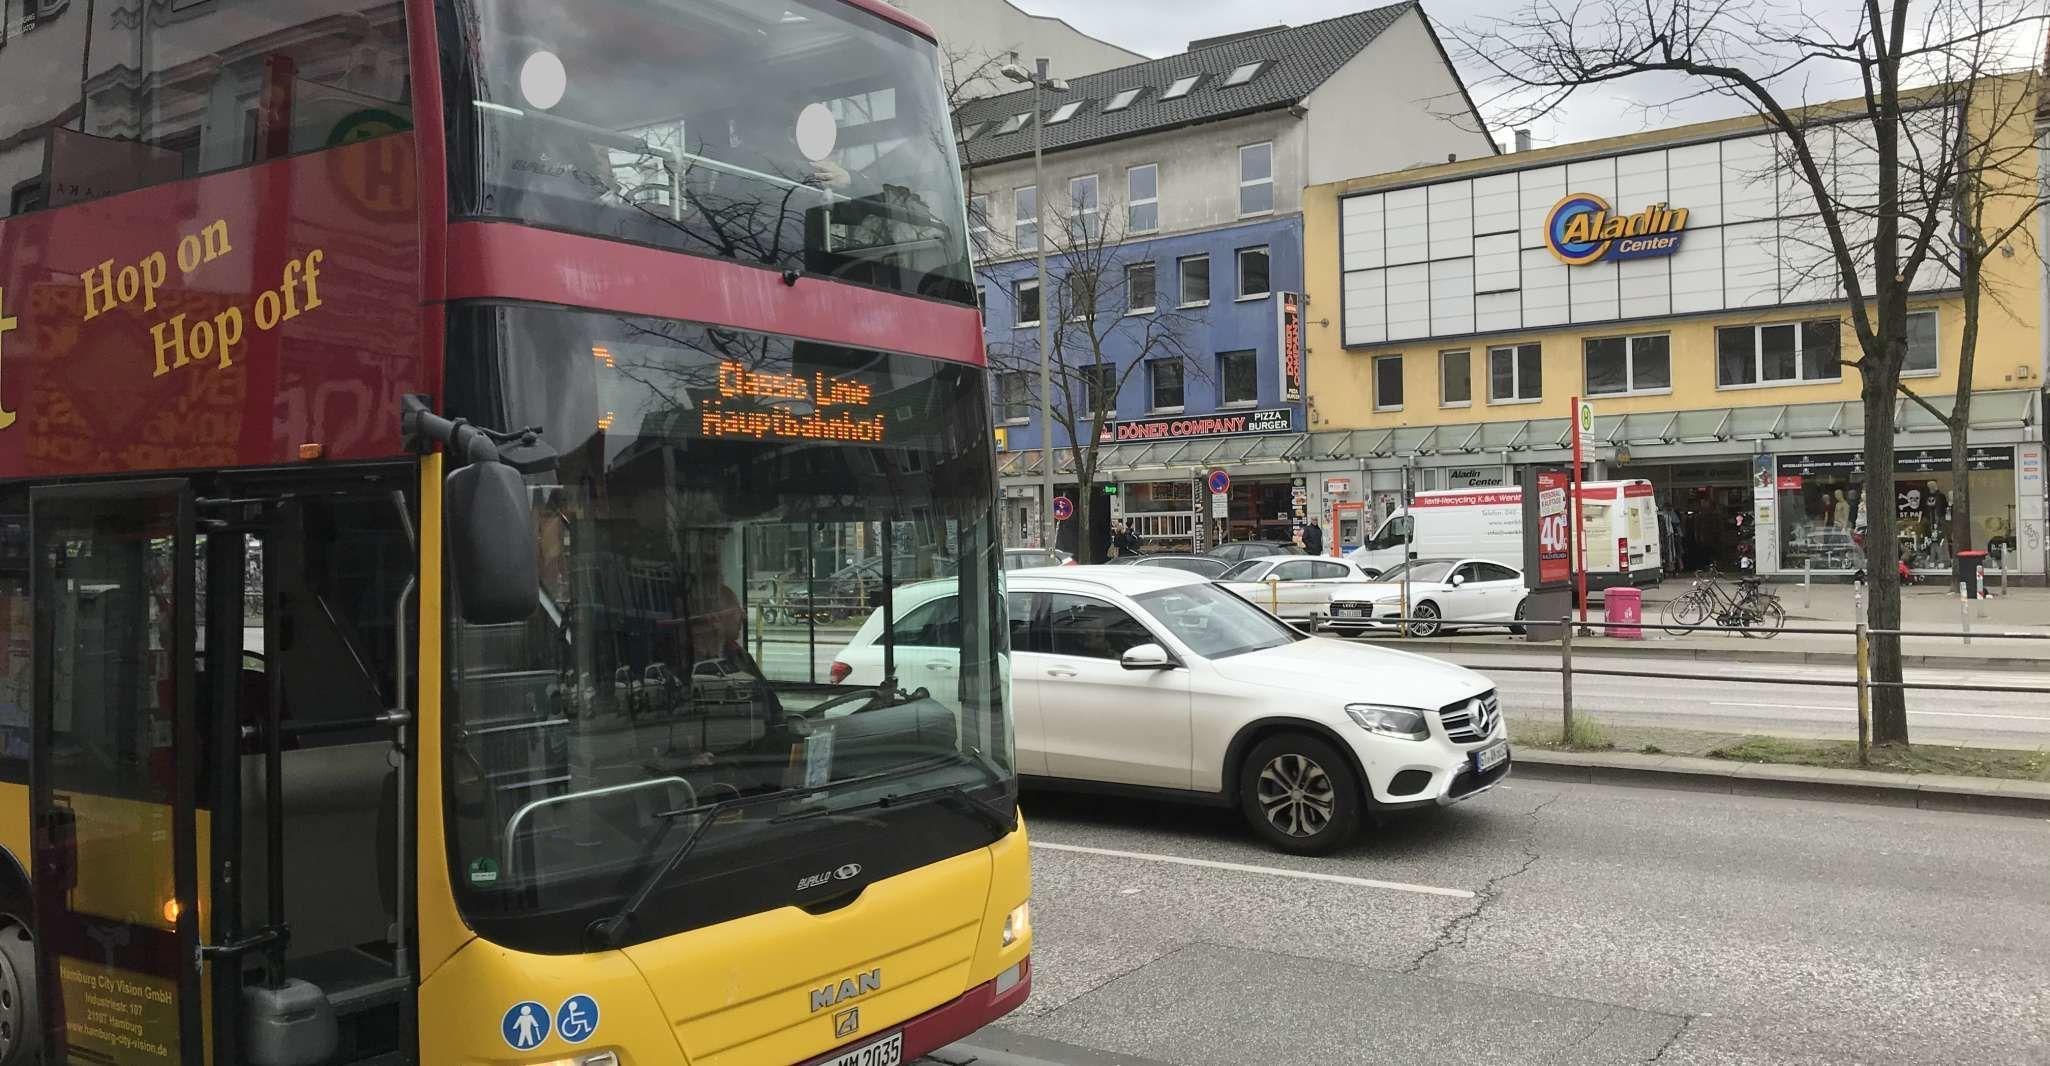 Hamburg: Hop-On/ Hop-Off Sightseeing Tour Classic Line